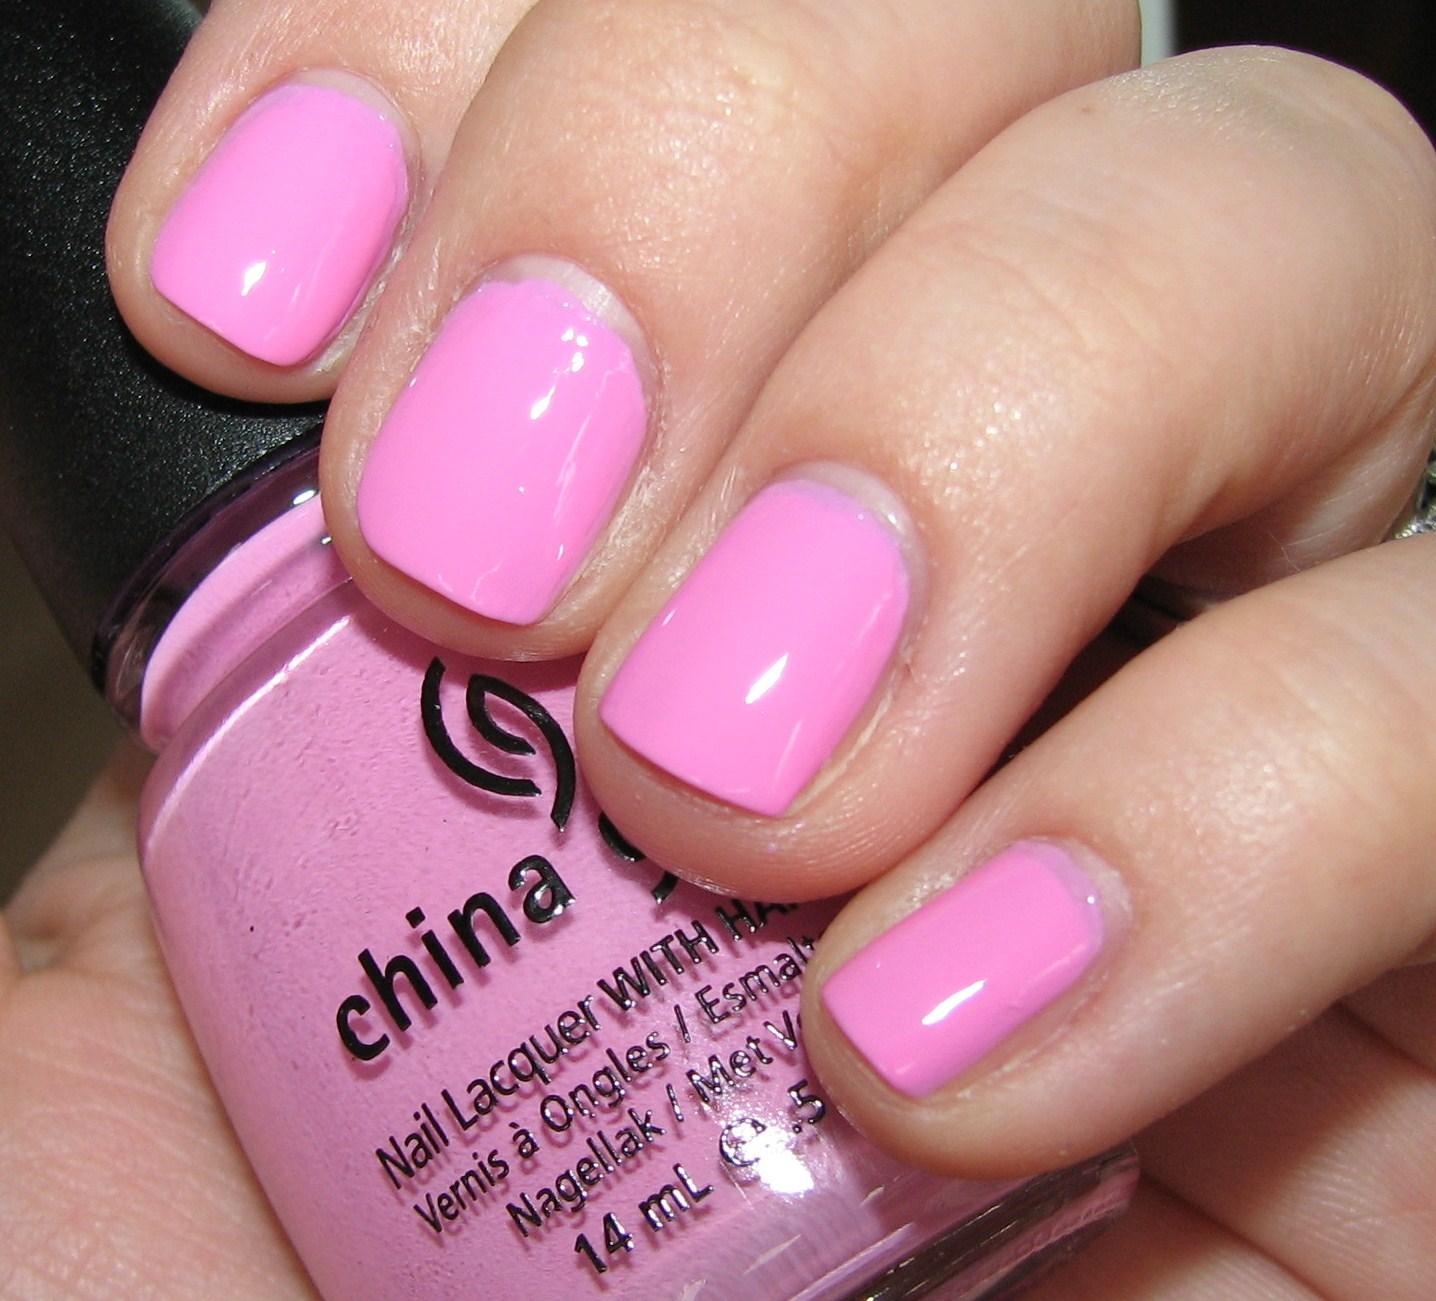 ... pink nails displaying 20 images for baby pink nails toolbar creator